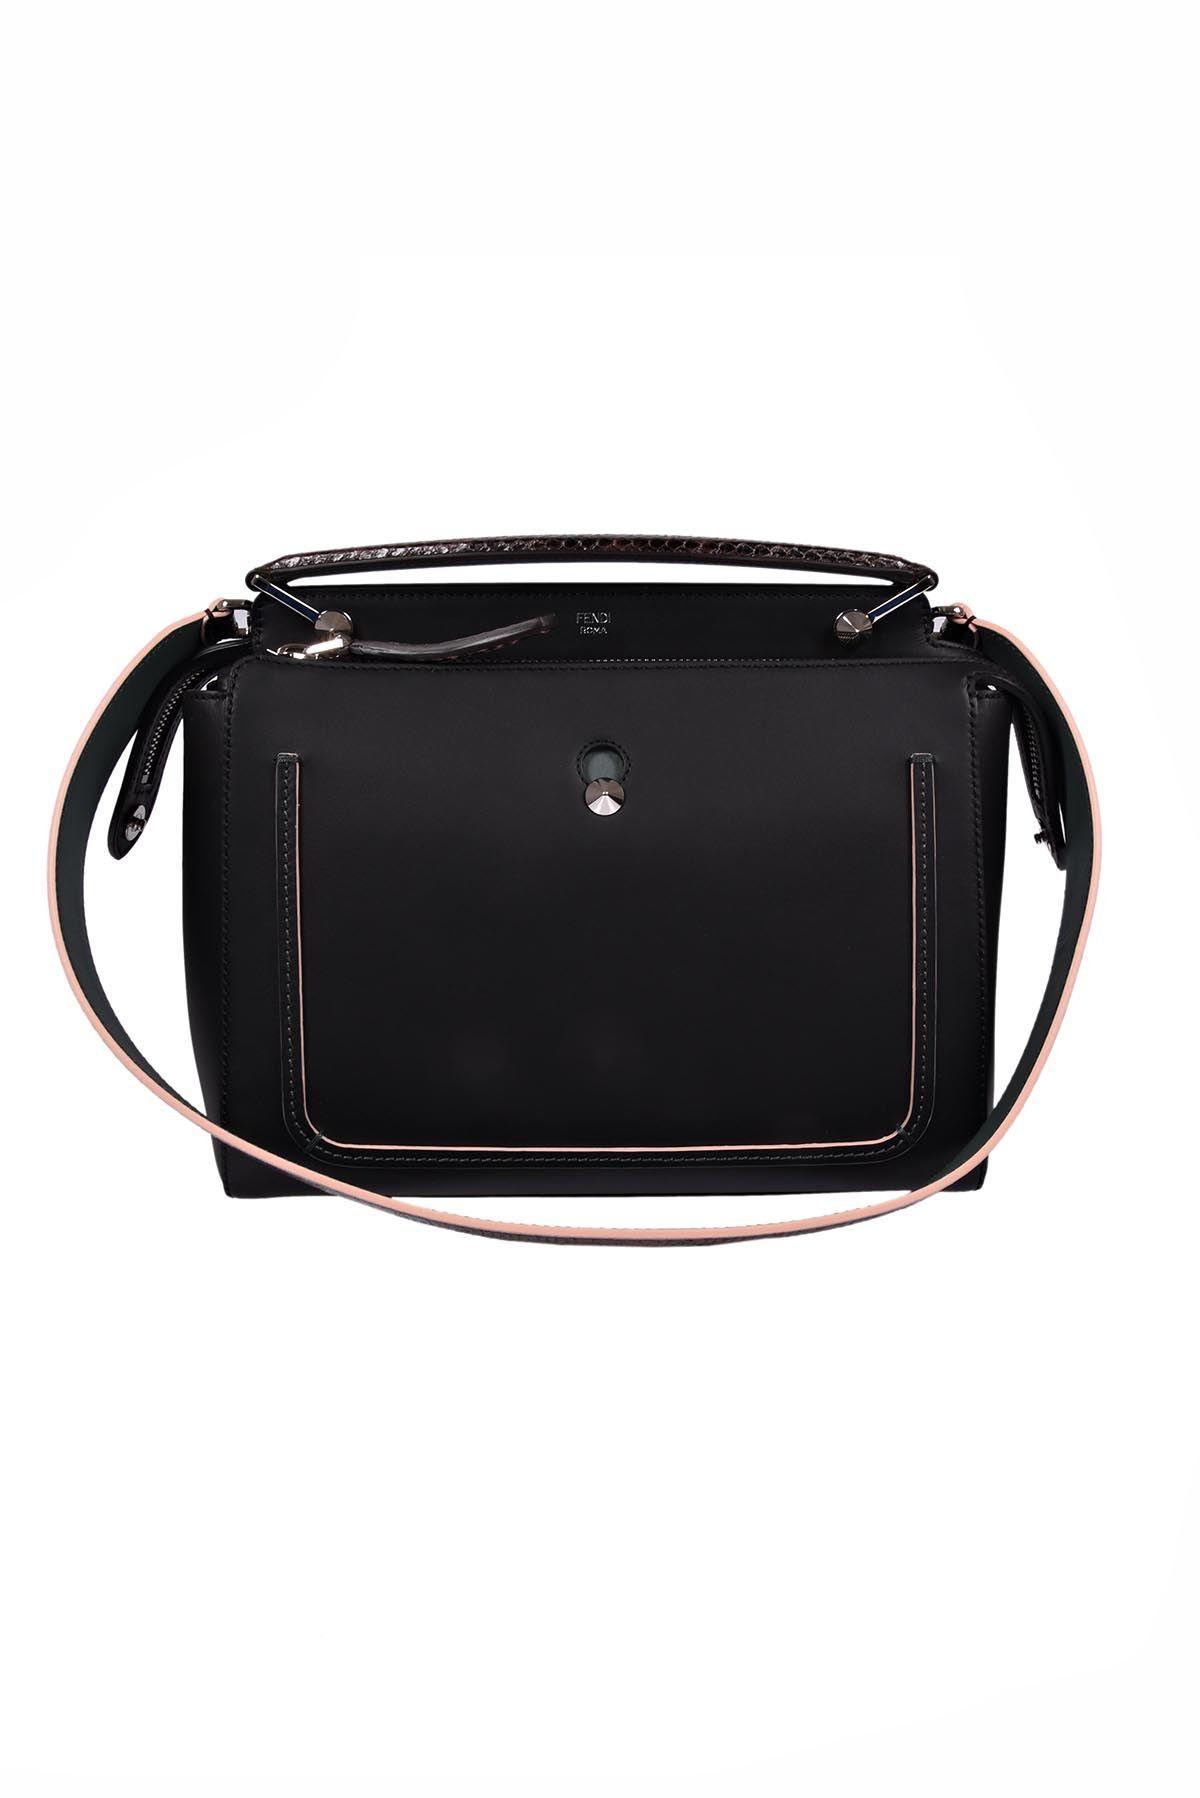 Fendi Dot Com Handbag In F07ha Nr+moro+mlc+p